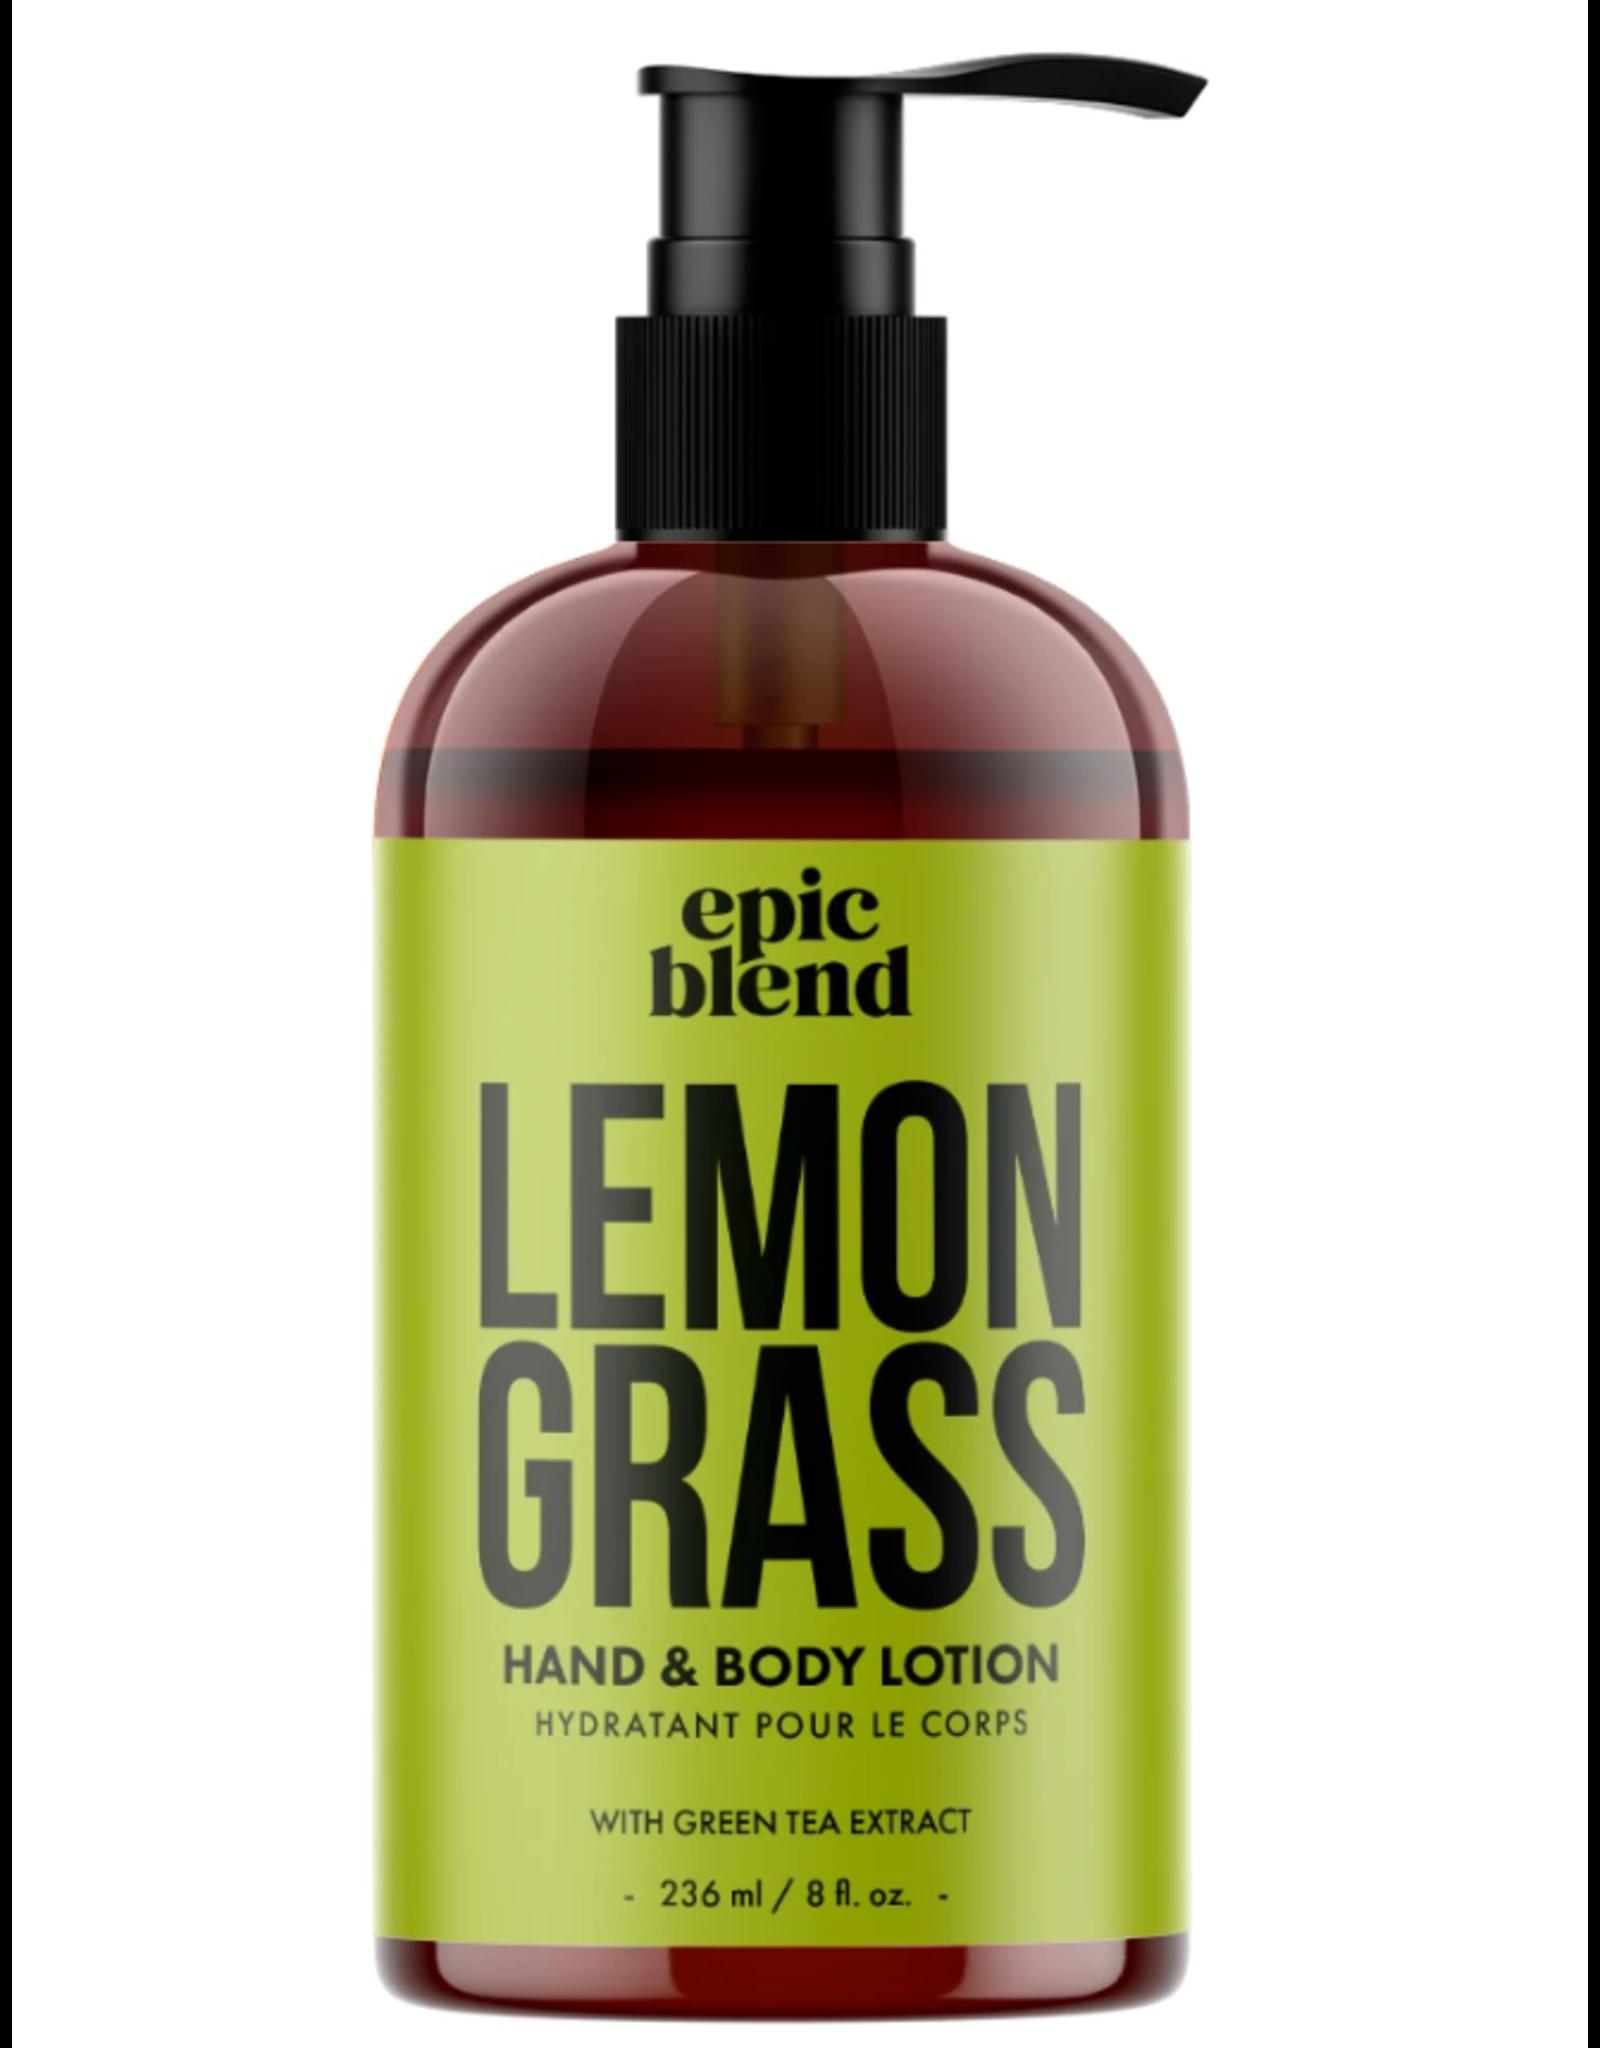 Epic Blend Lemongrass Hand & Body Lotion